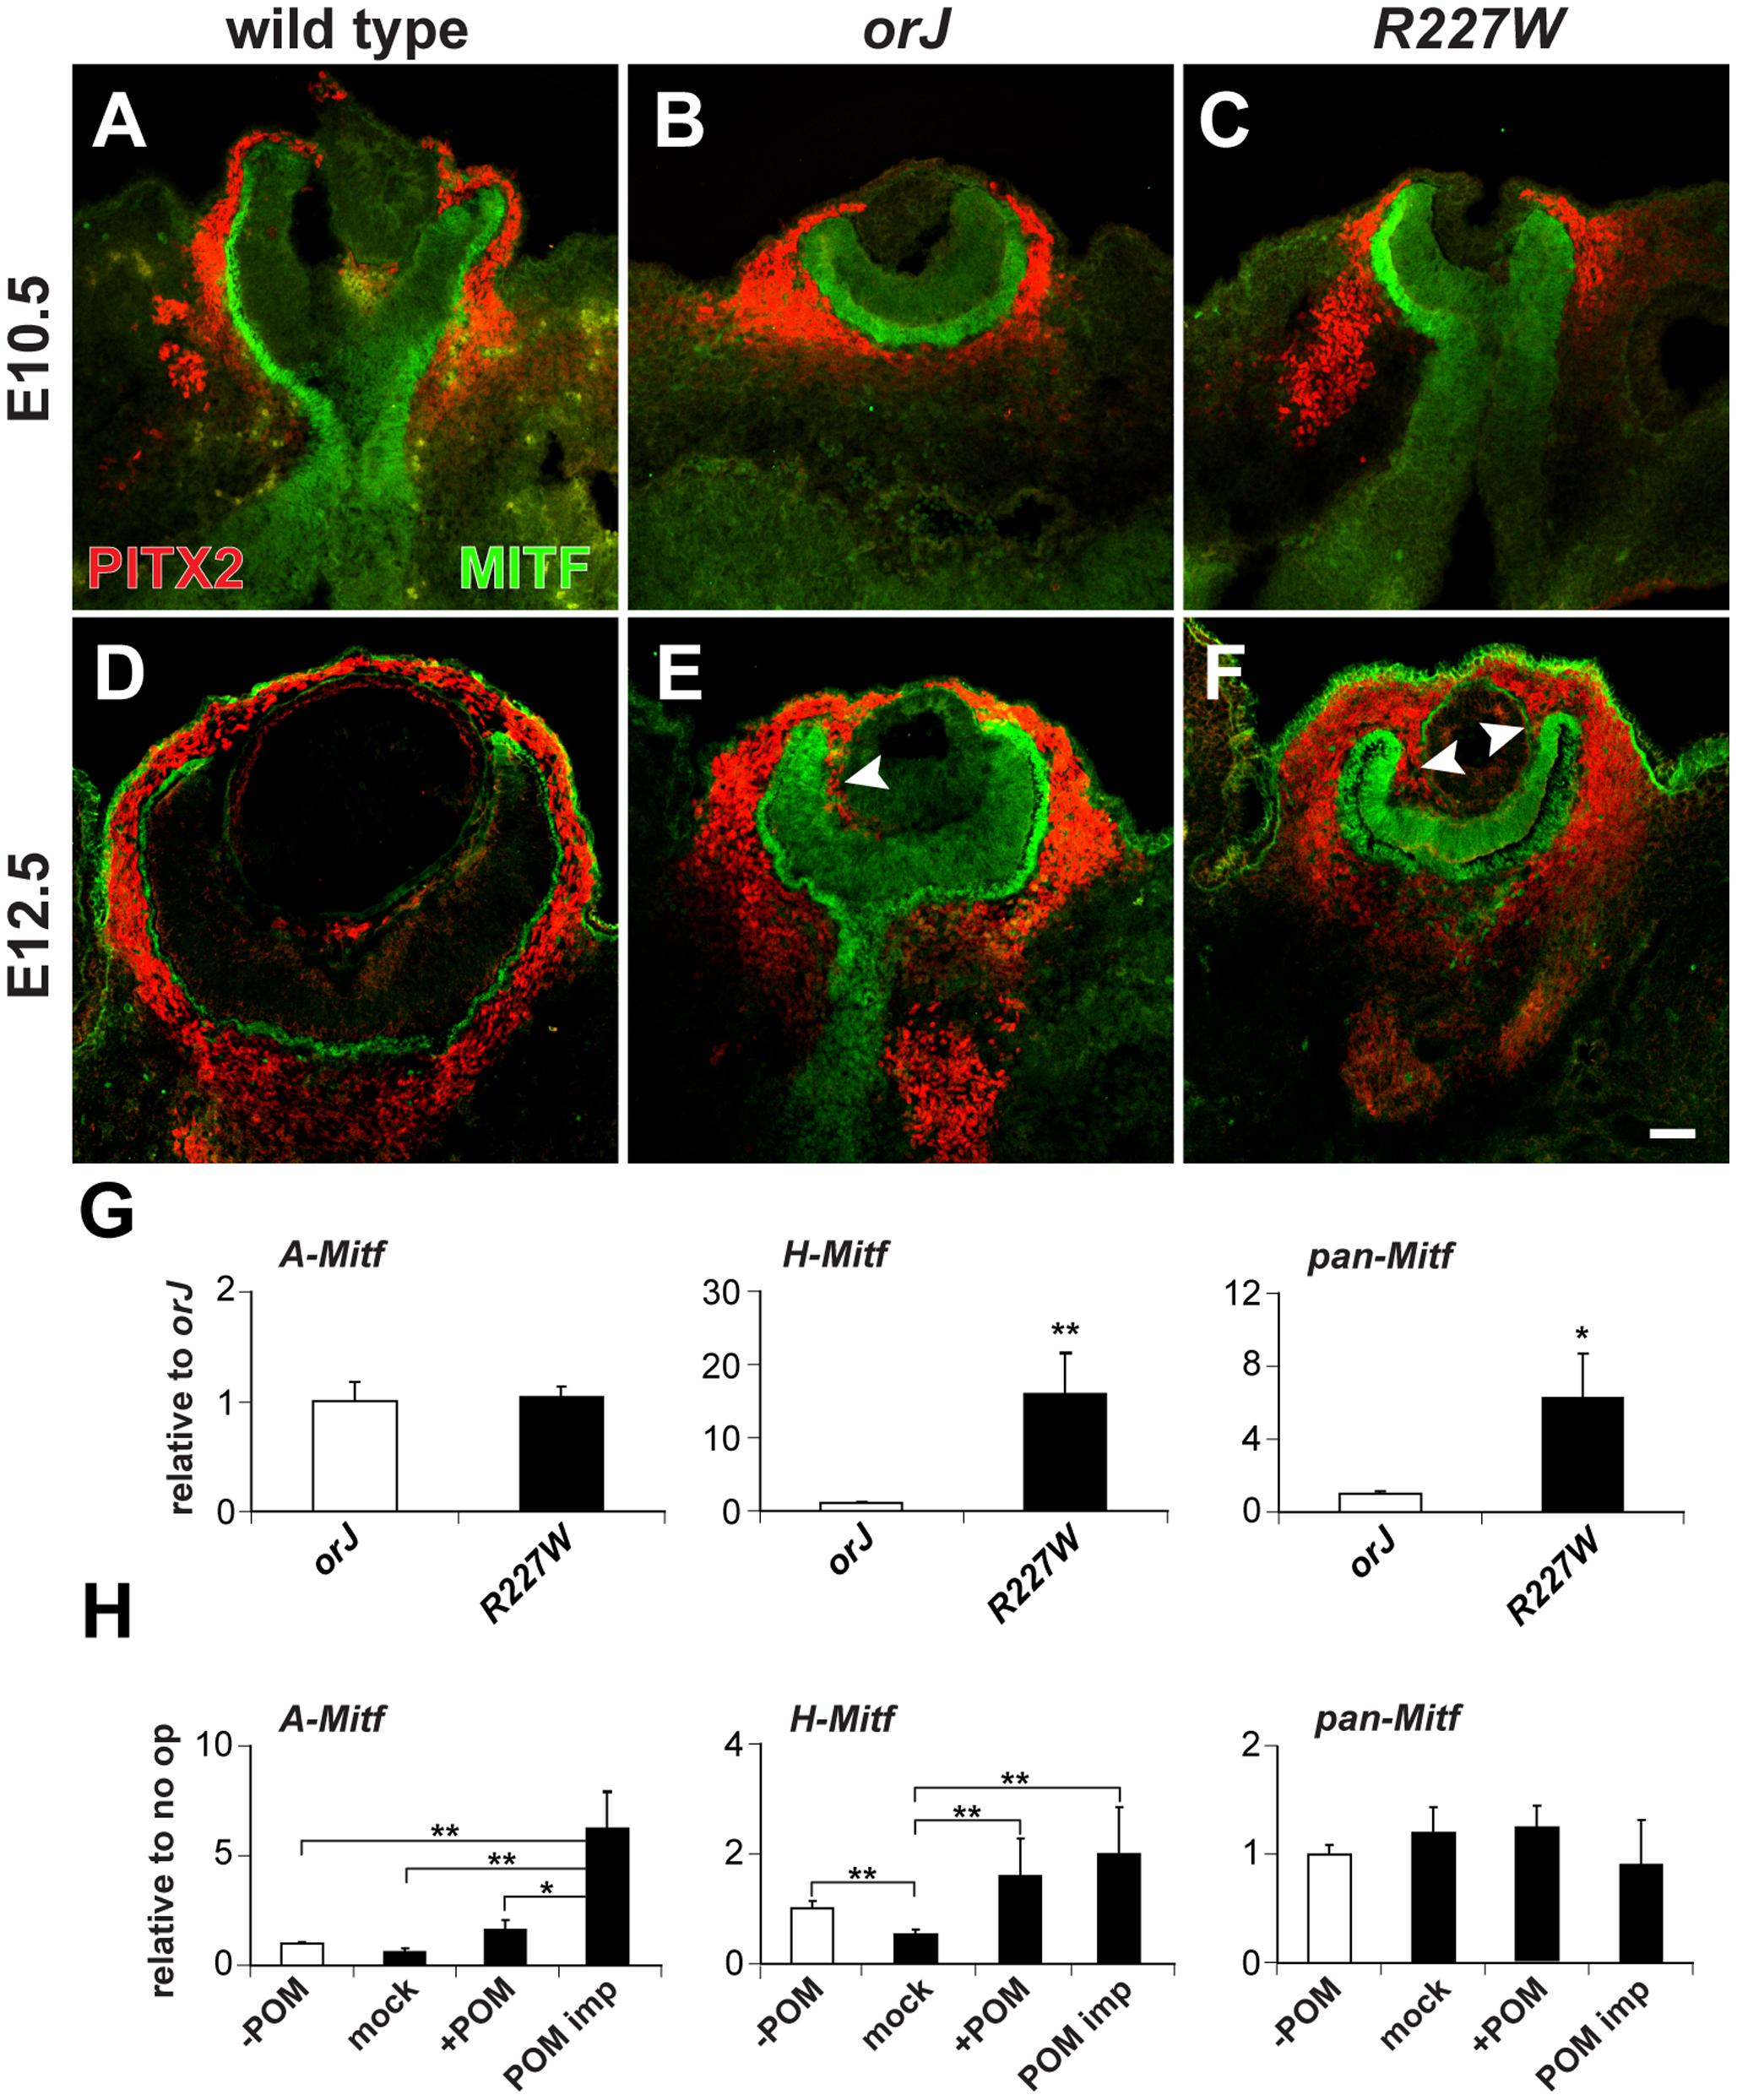 Influence of POM on Mitf expression in the <i>R227W</i> retina.